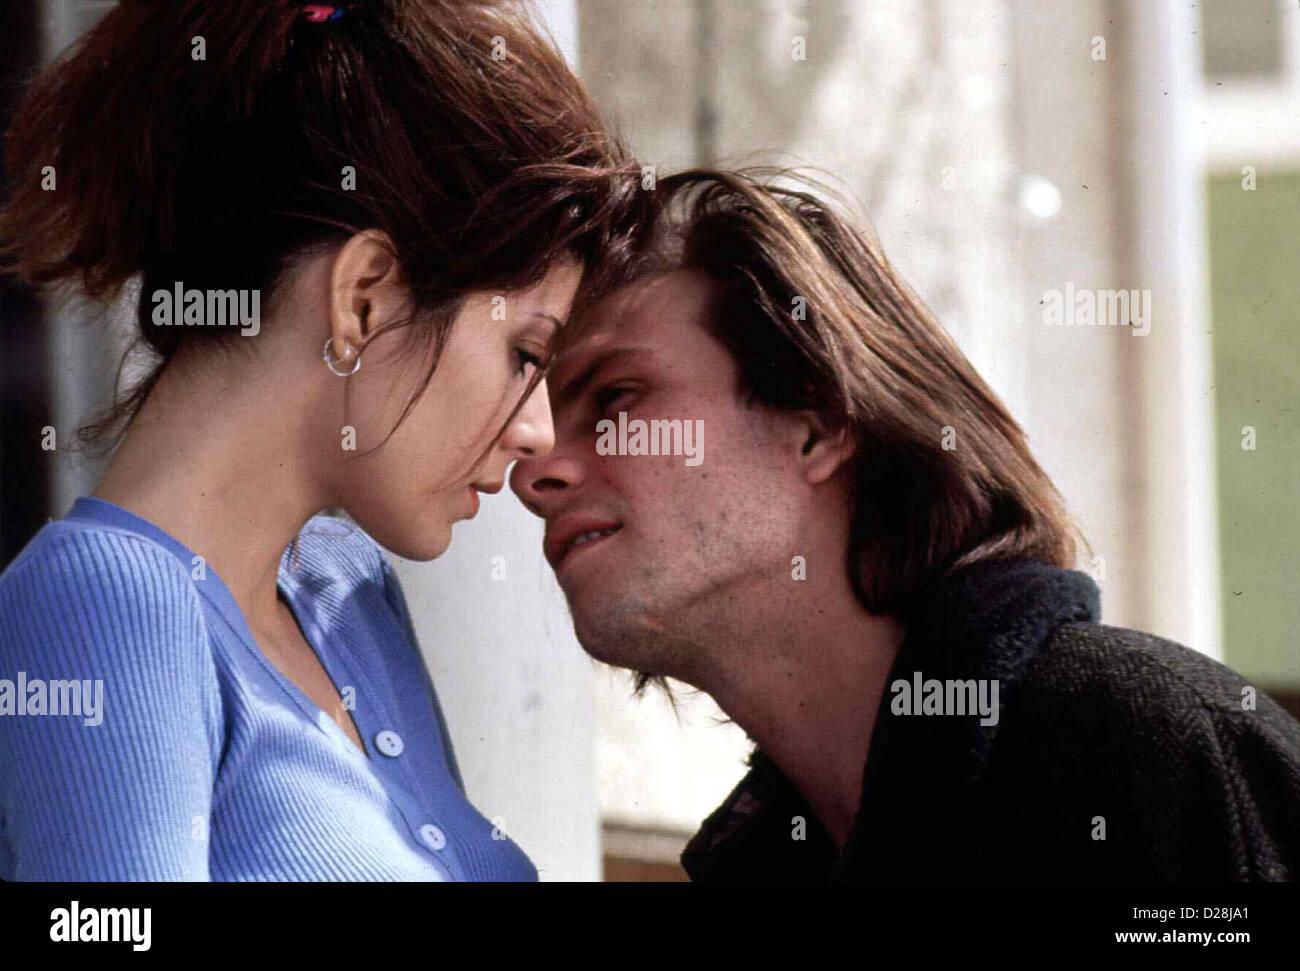 Real Love  Untamed Heart  Marisa Tomei, Christian Slater Als Caroline (Marisa Tomei), die als Kellnerin arbeitet, - Stock Image